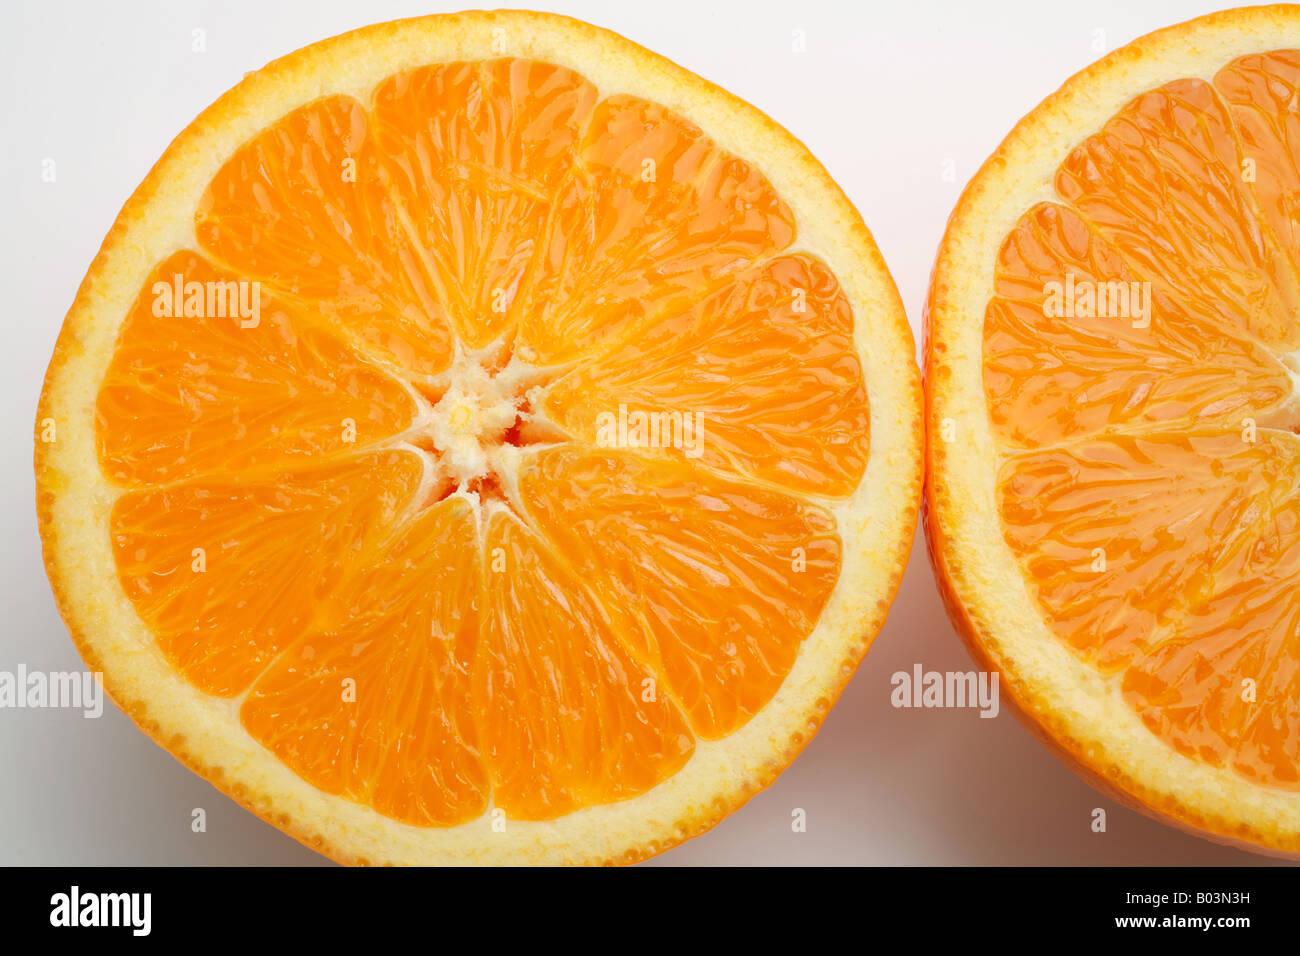 An Orange Cut In Half Showing One And A Half Orange Slices